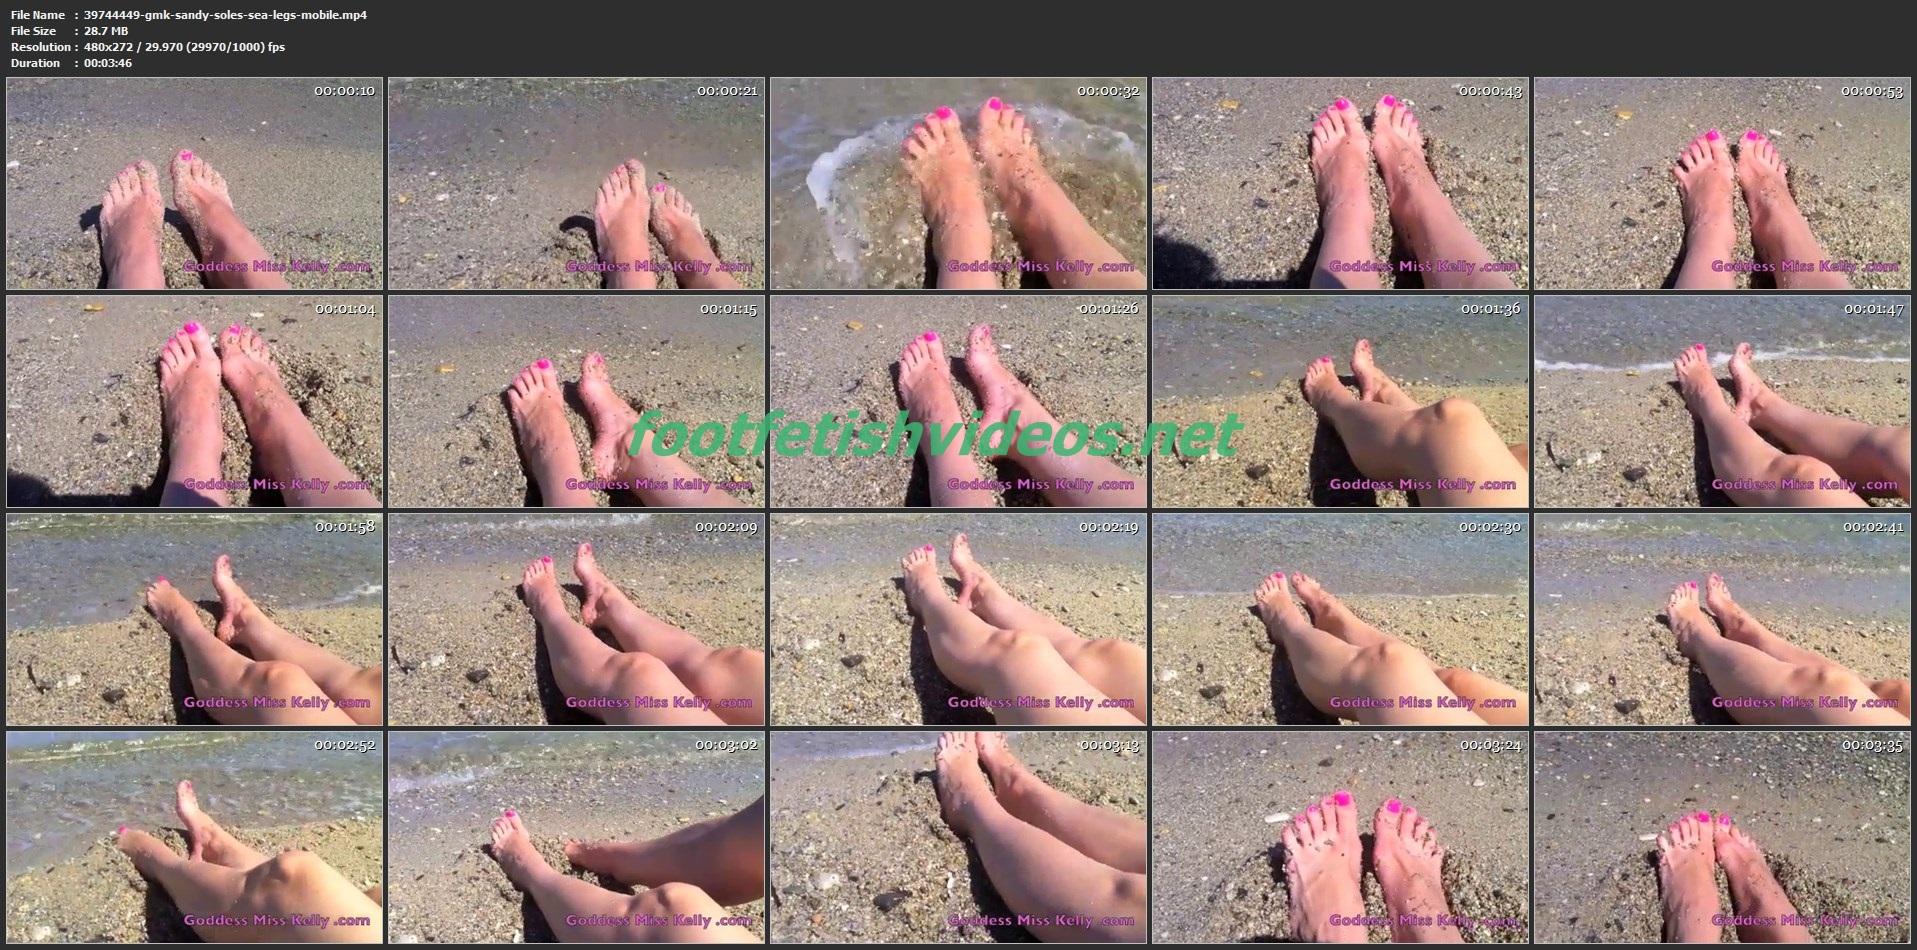 goddessmskelly-39744449-gmk-sandy-soles-sea-legs-mobile-mp4